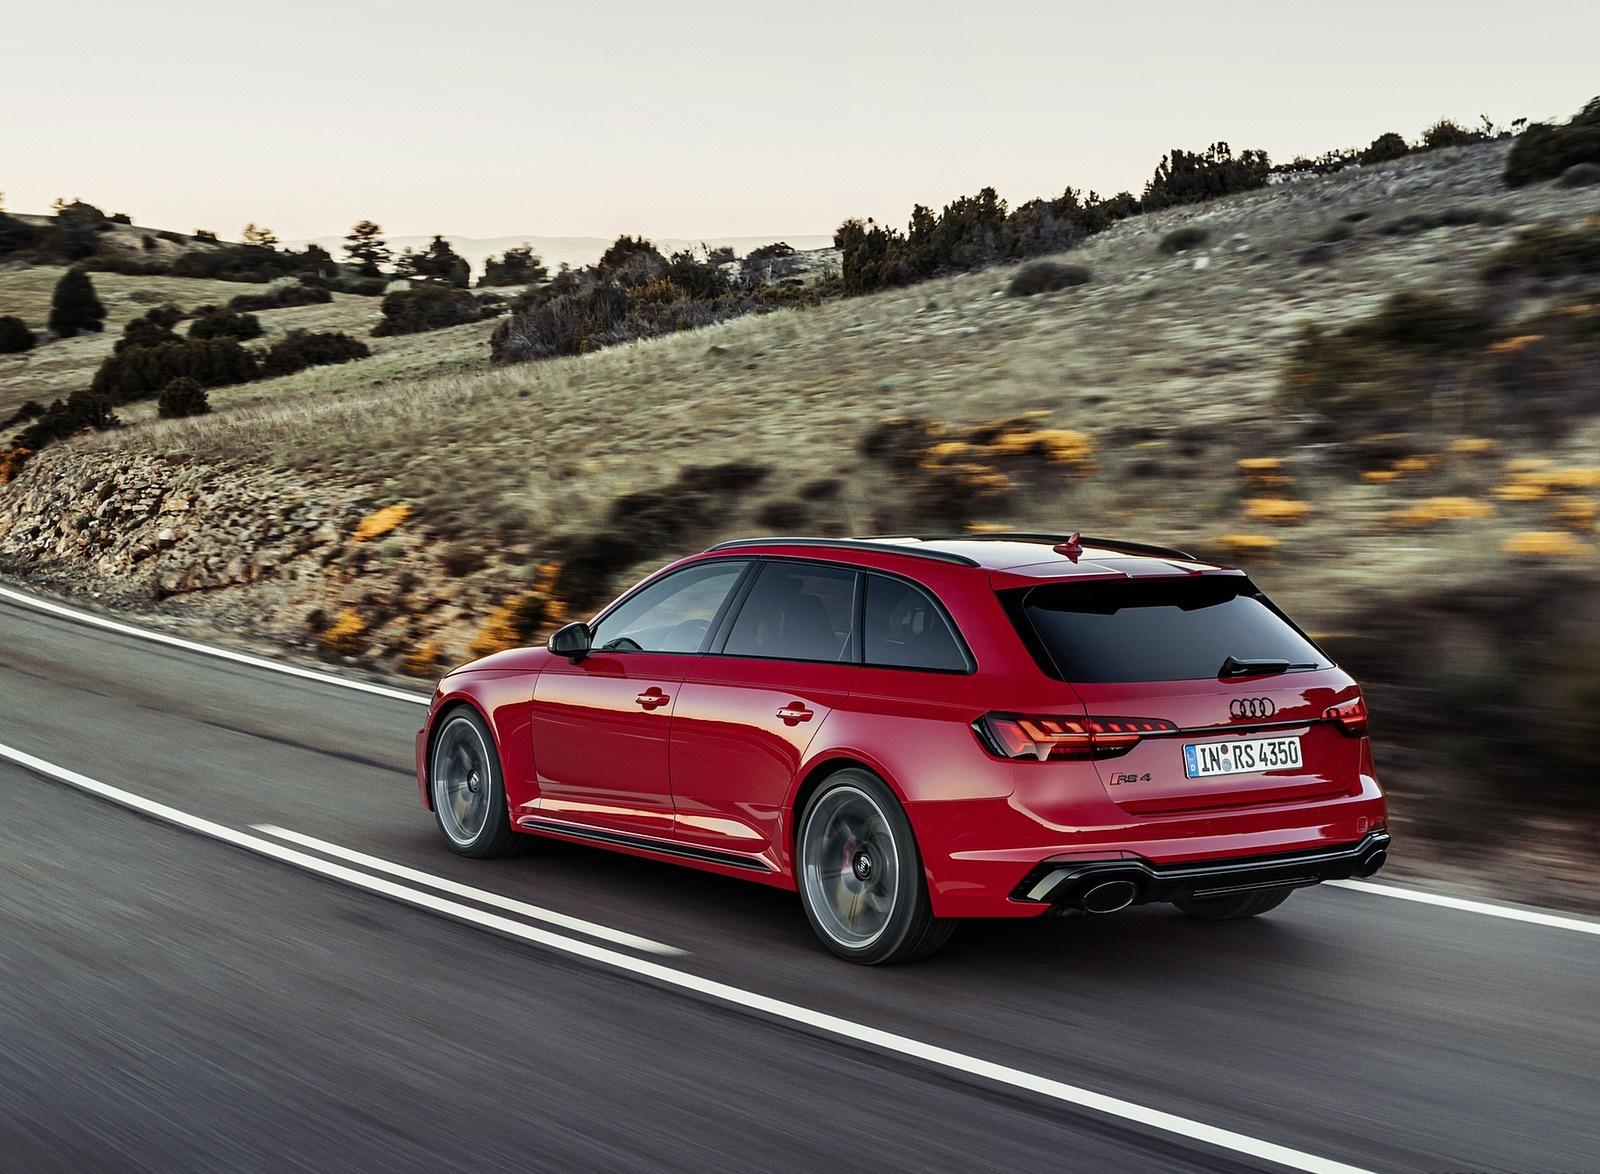 2020 Audi RS 4 Avant (Color: Tango Red) Rear Three-Quarter Wallpapers (7)